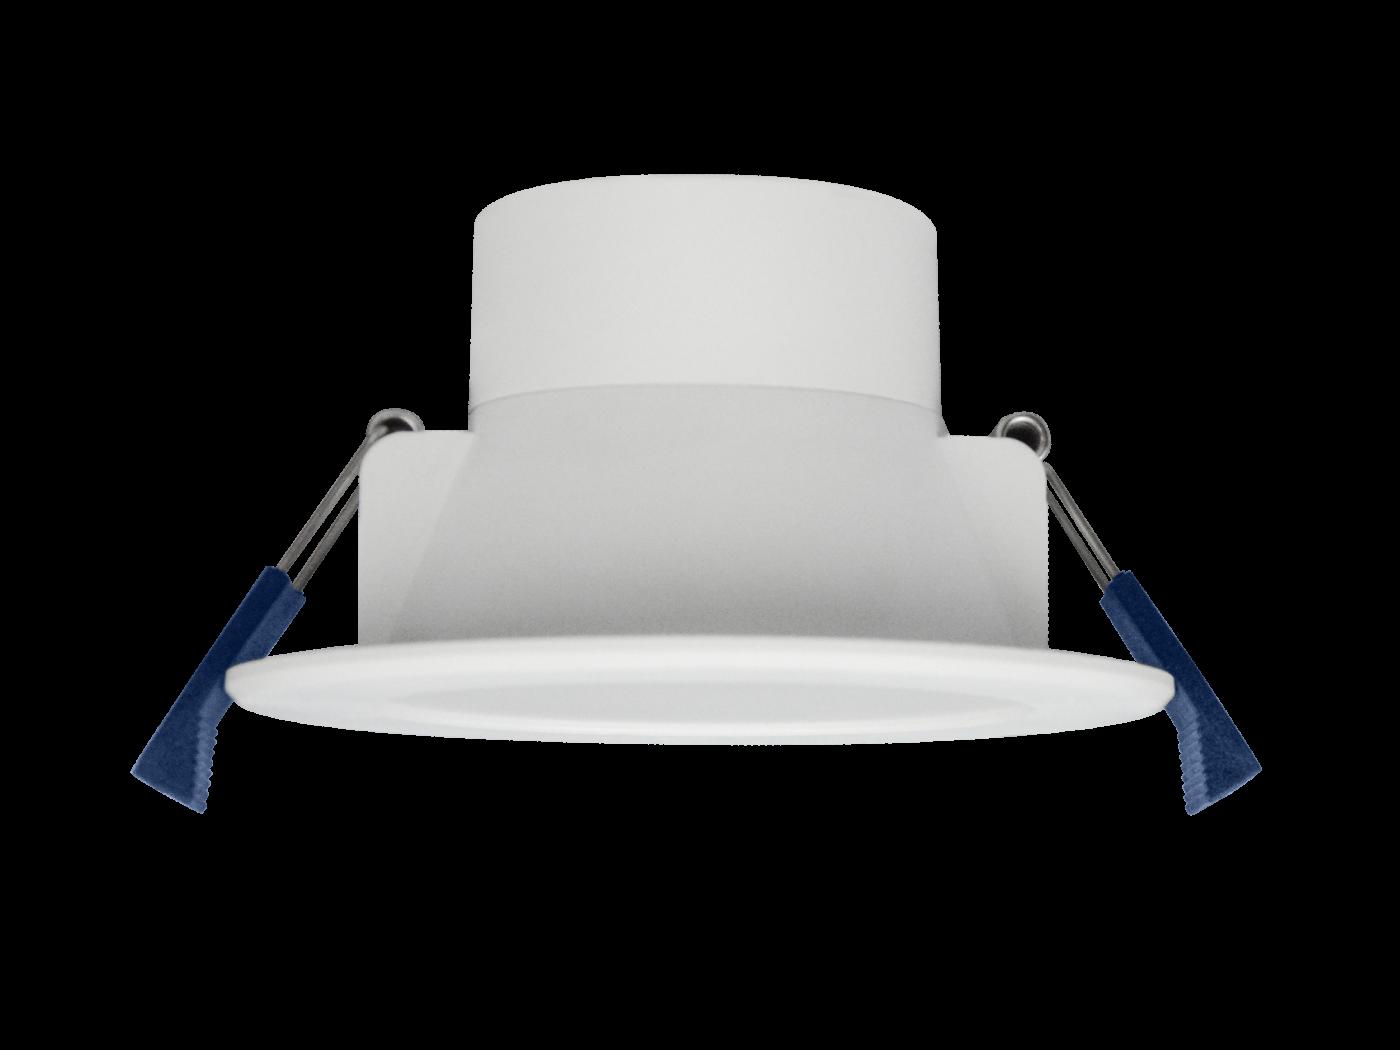 Plastial G3 Mini Flush Downlight